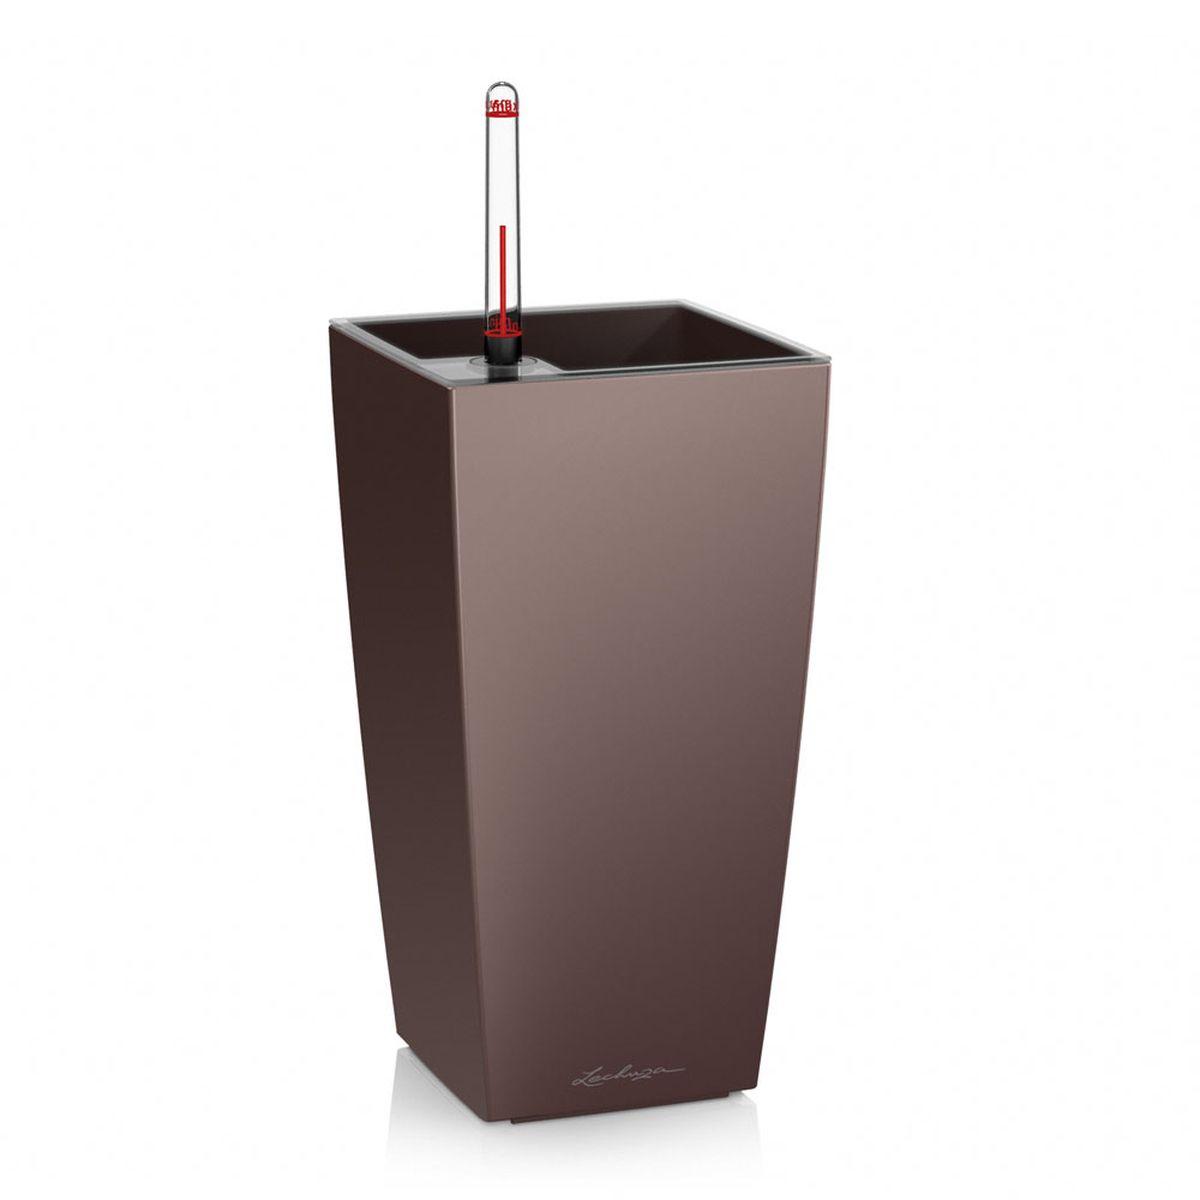 "Кашпо Lechuza ""Mini Cubi"", с системой автополива, цвет: эспрессо, 9 х 9 х 18 см"